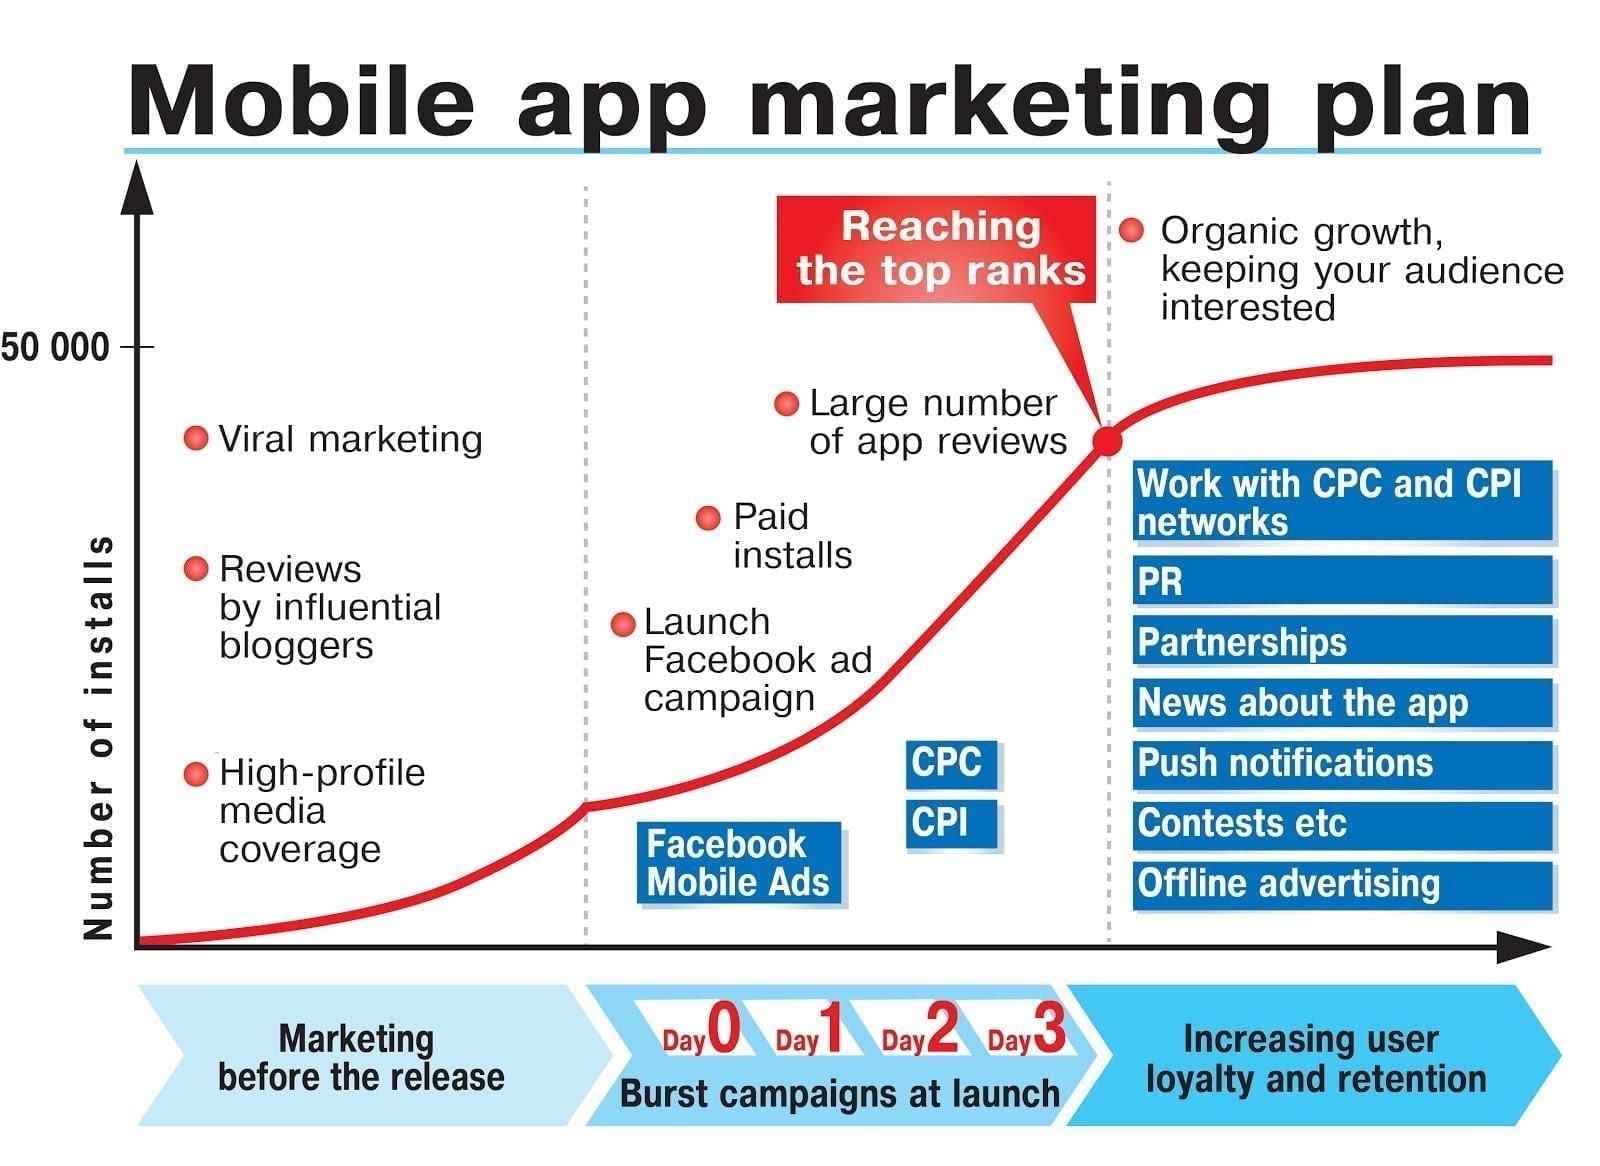 Mobile app marketing plan